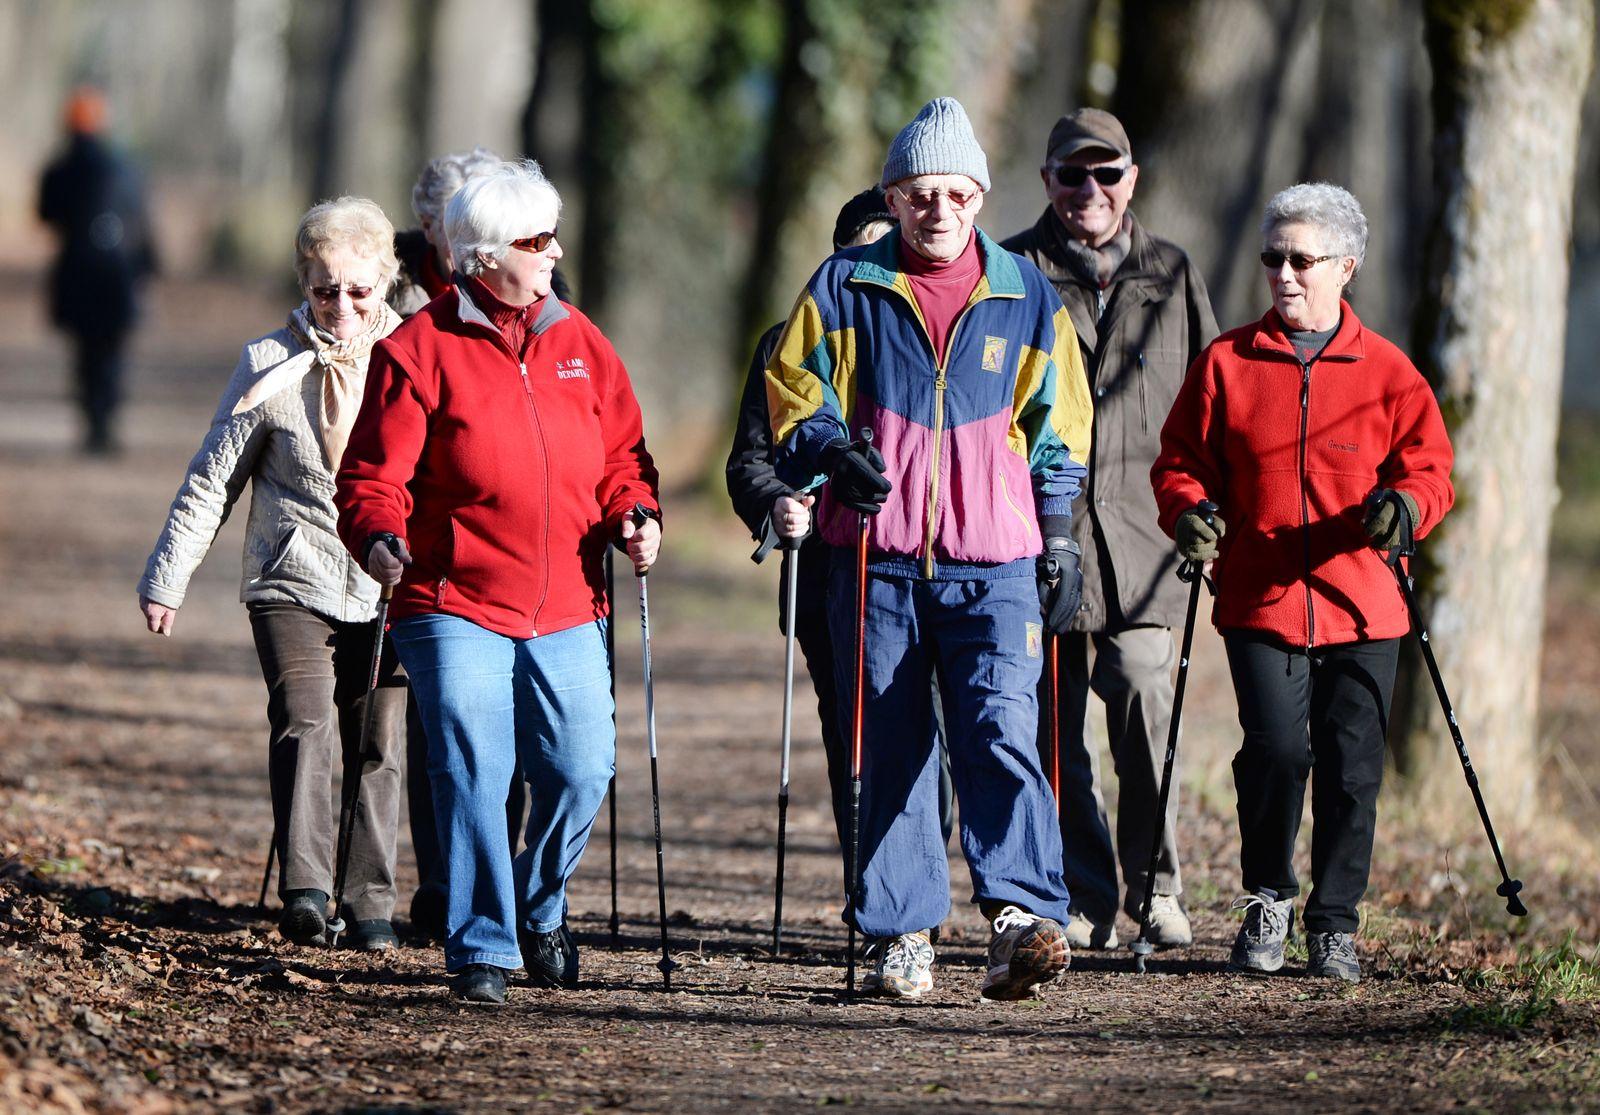 Rente / Rentner / Senioren / Aktiv im Alter